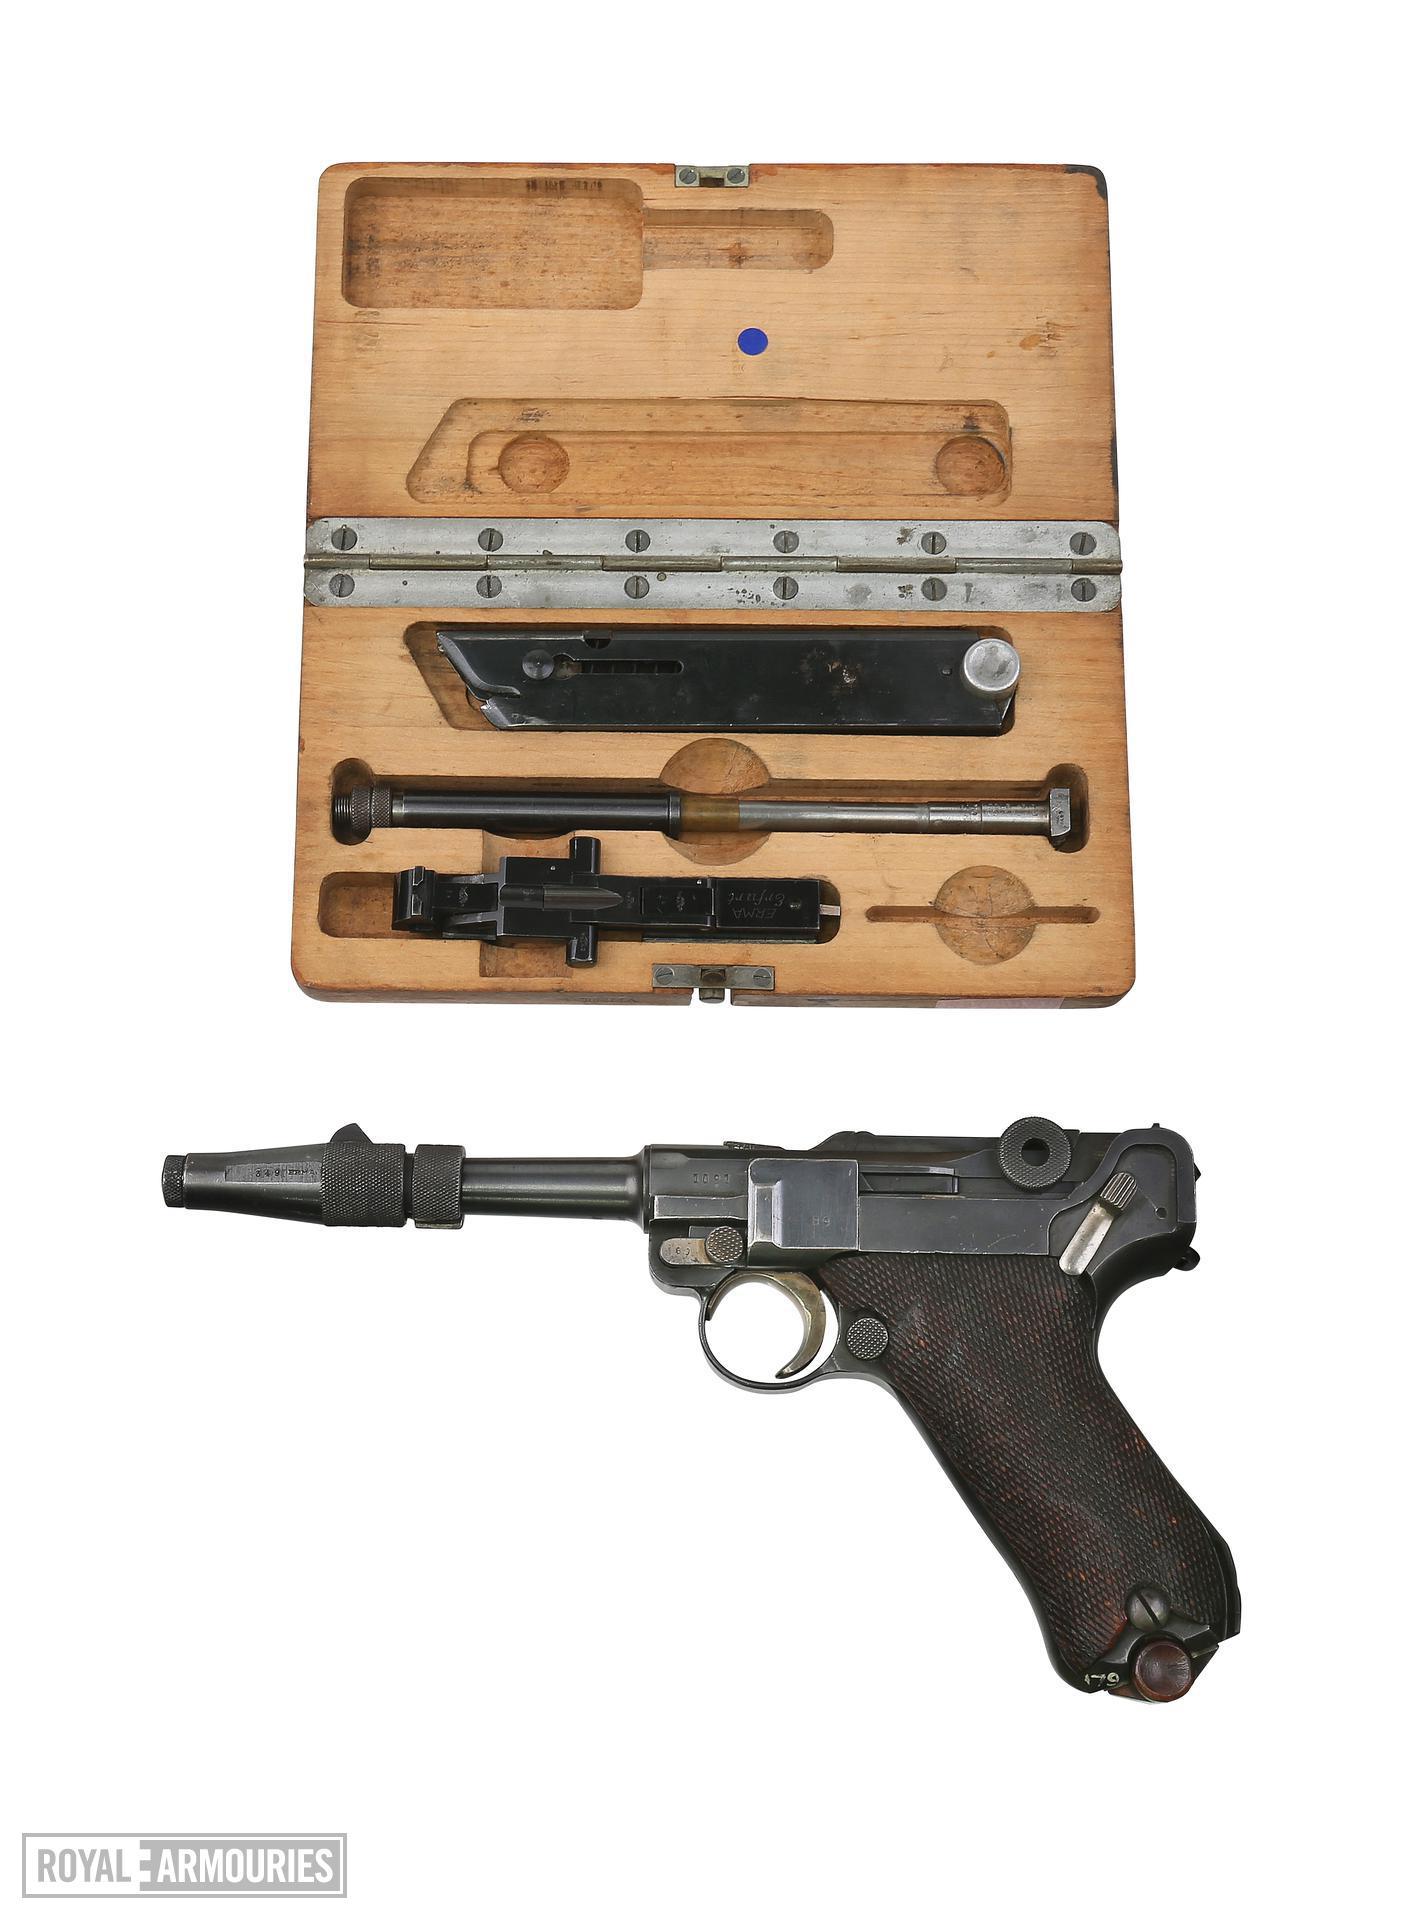 Centrefire self-loading pistol - Luger P08